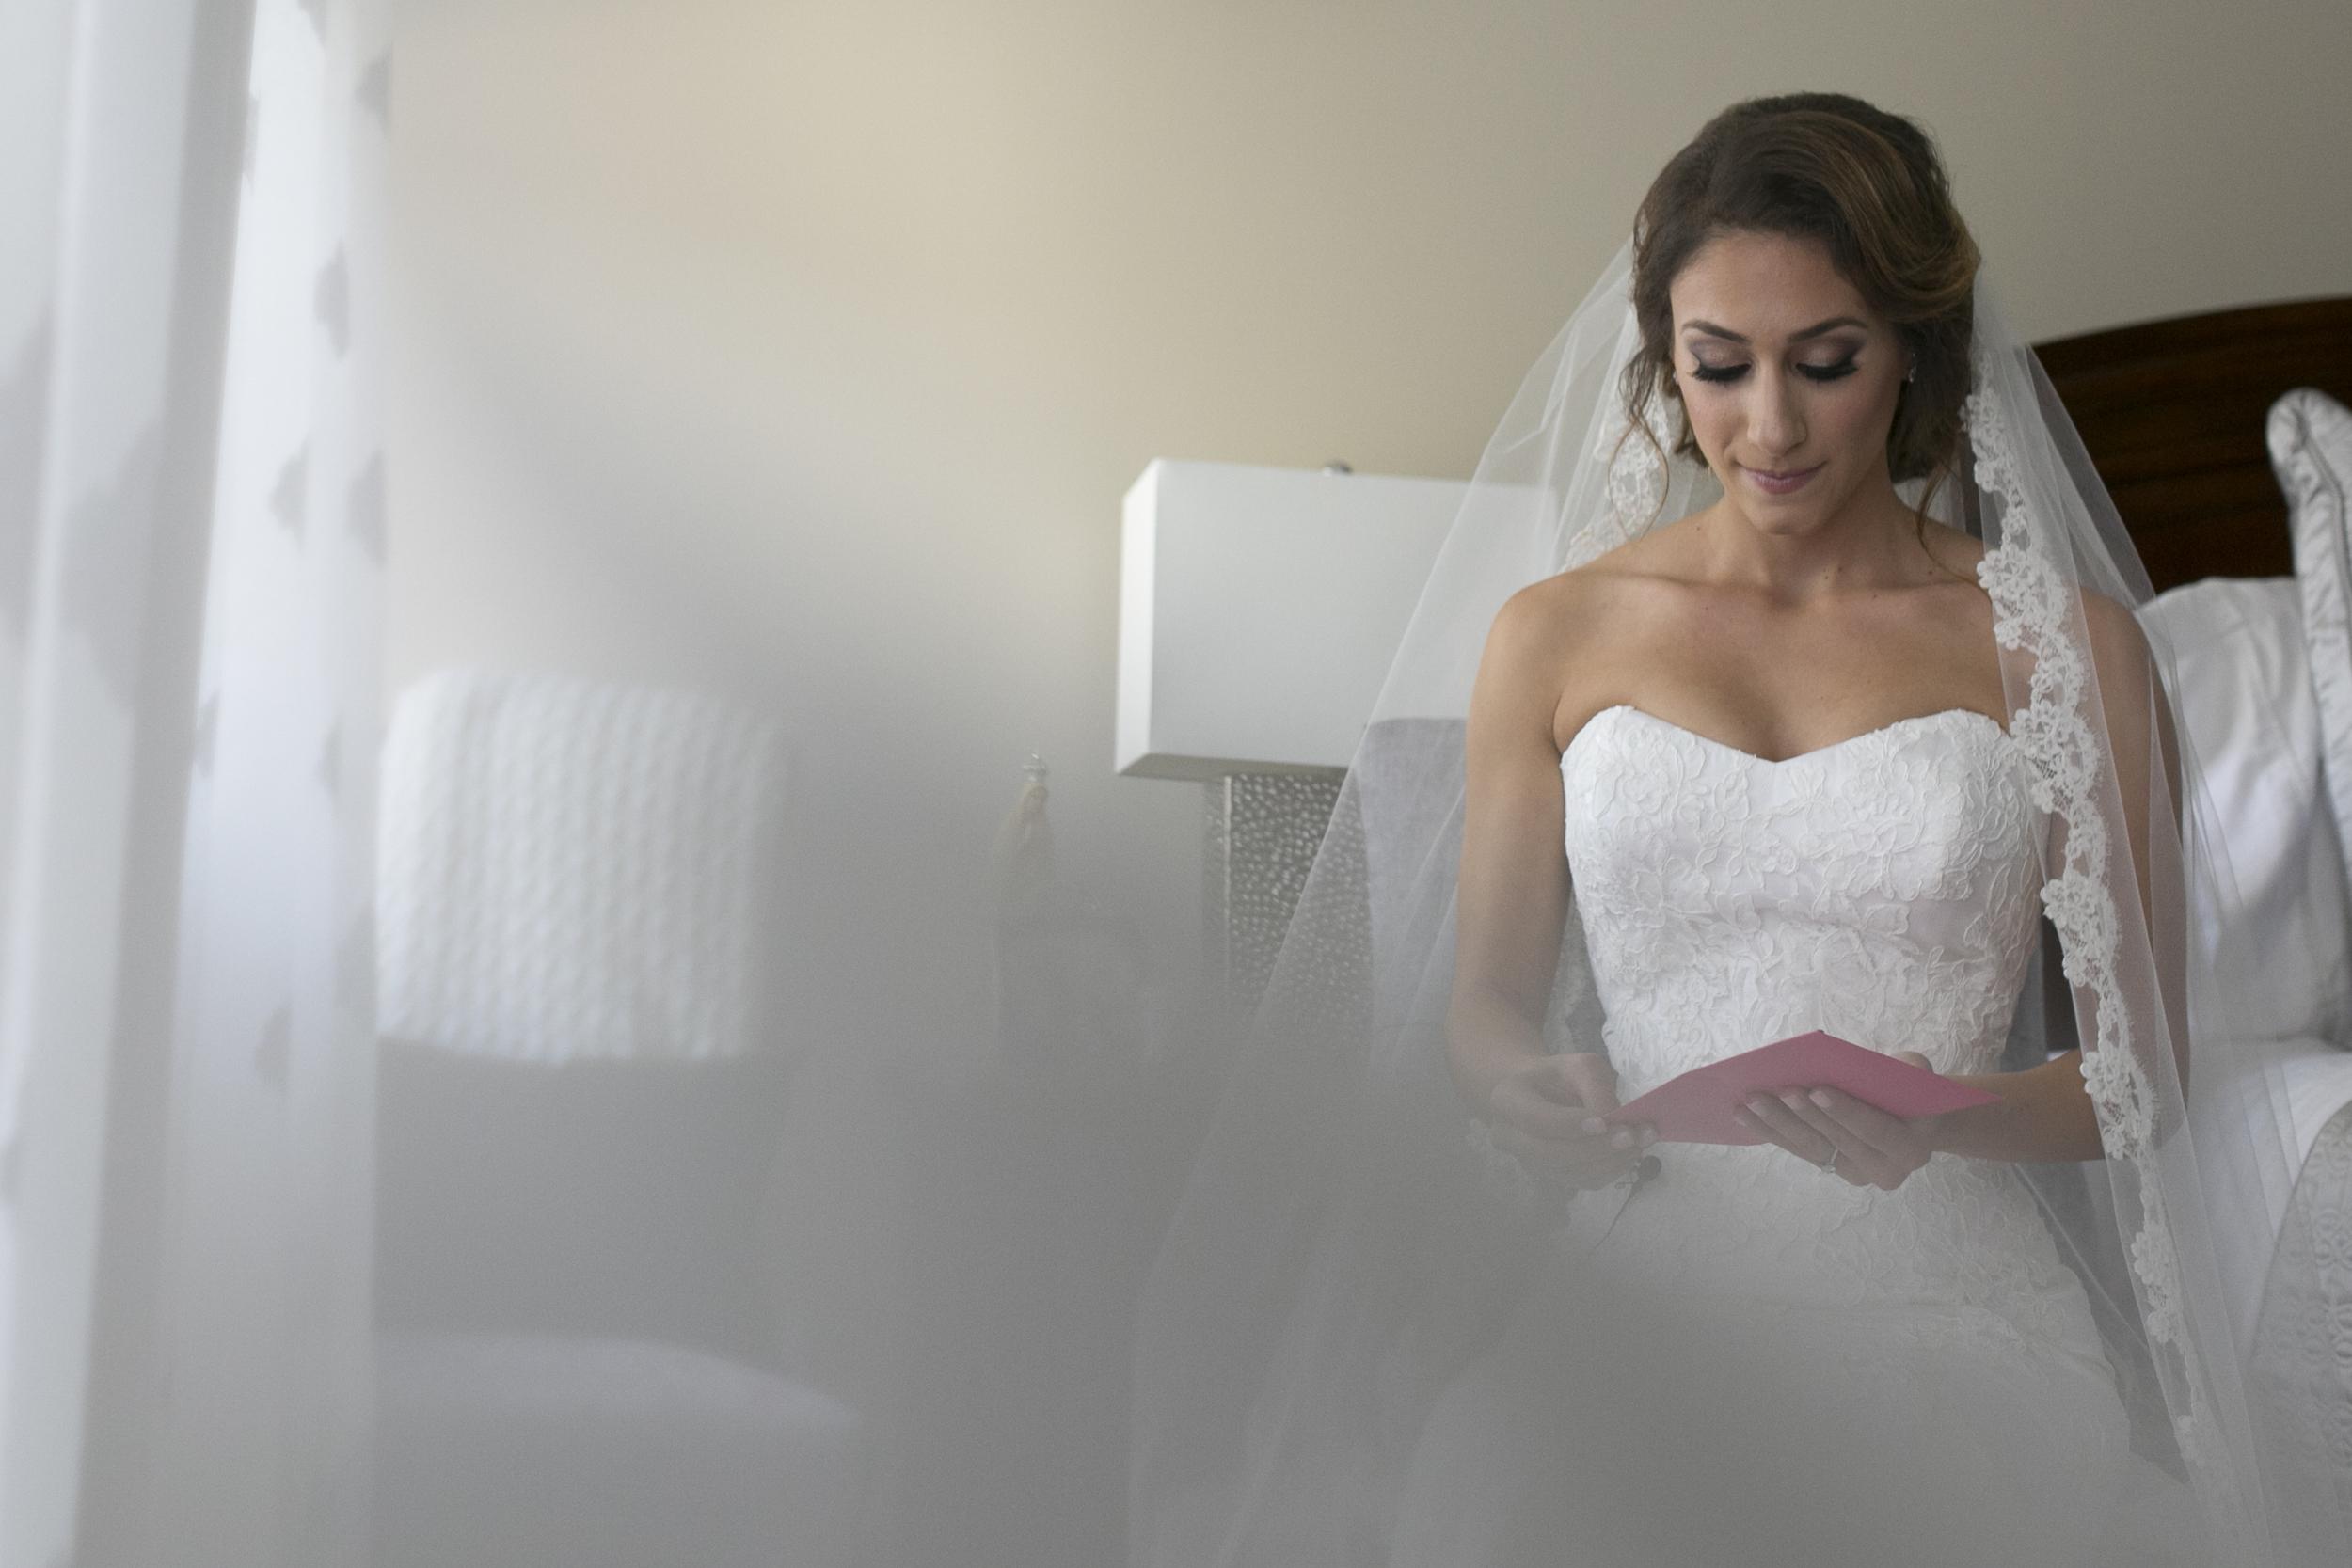 Persian Wedding-South San Francisco-Meo Baaklini19.jpg